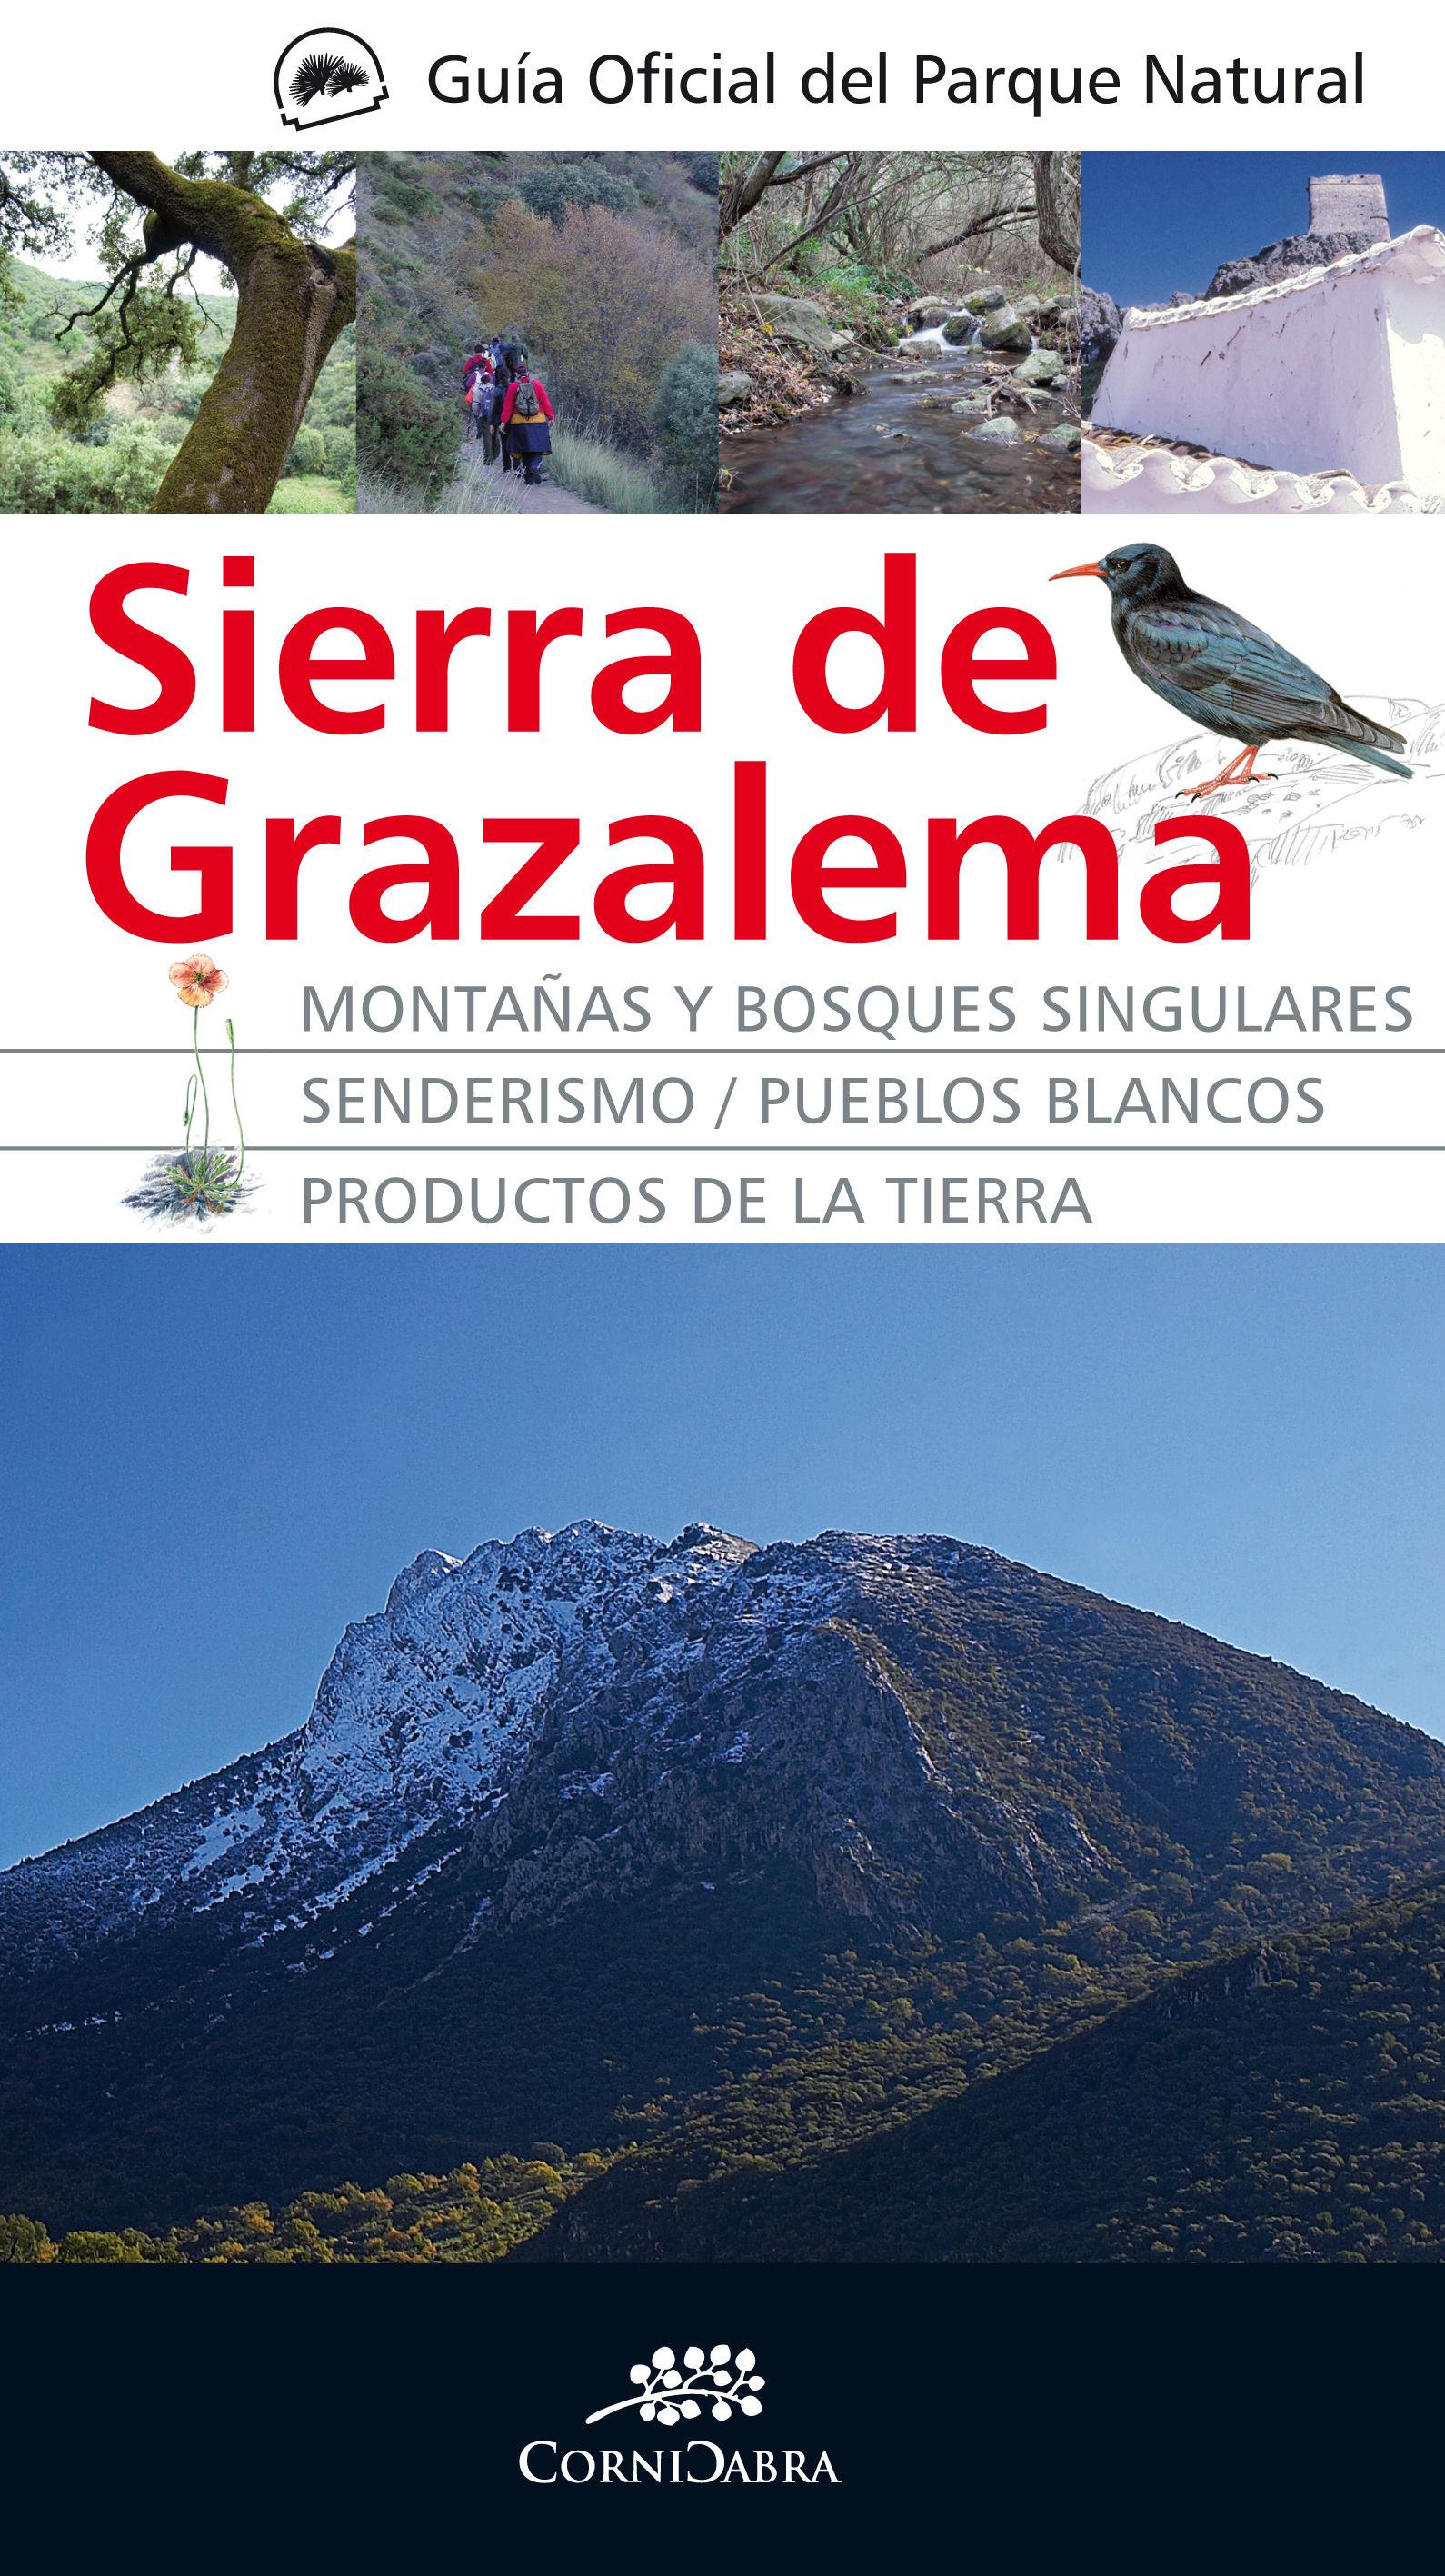 SIERRA DE GRAZALEMA GUIA OFICIAL DEL PARQUE NATURAL